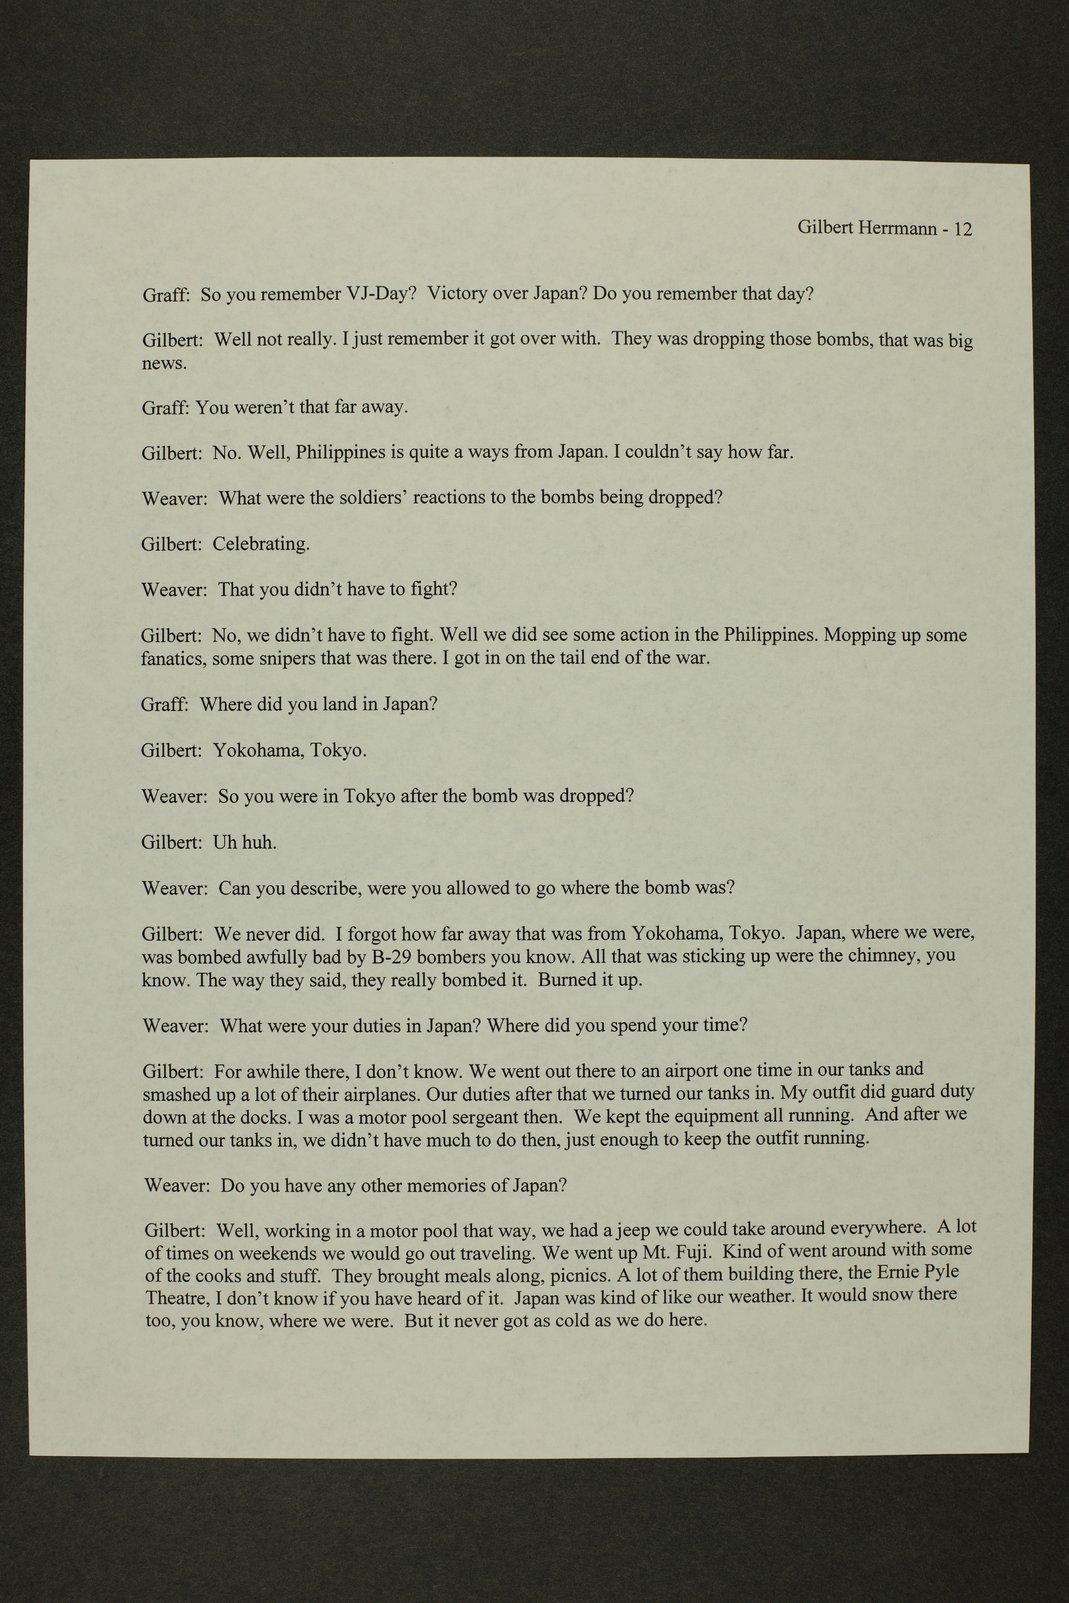 Gilbert Herrman interview, WWII oral history, Kinsley, Kansas - 12